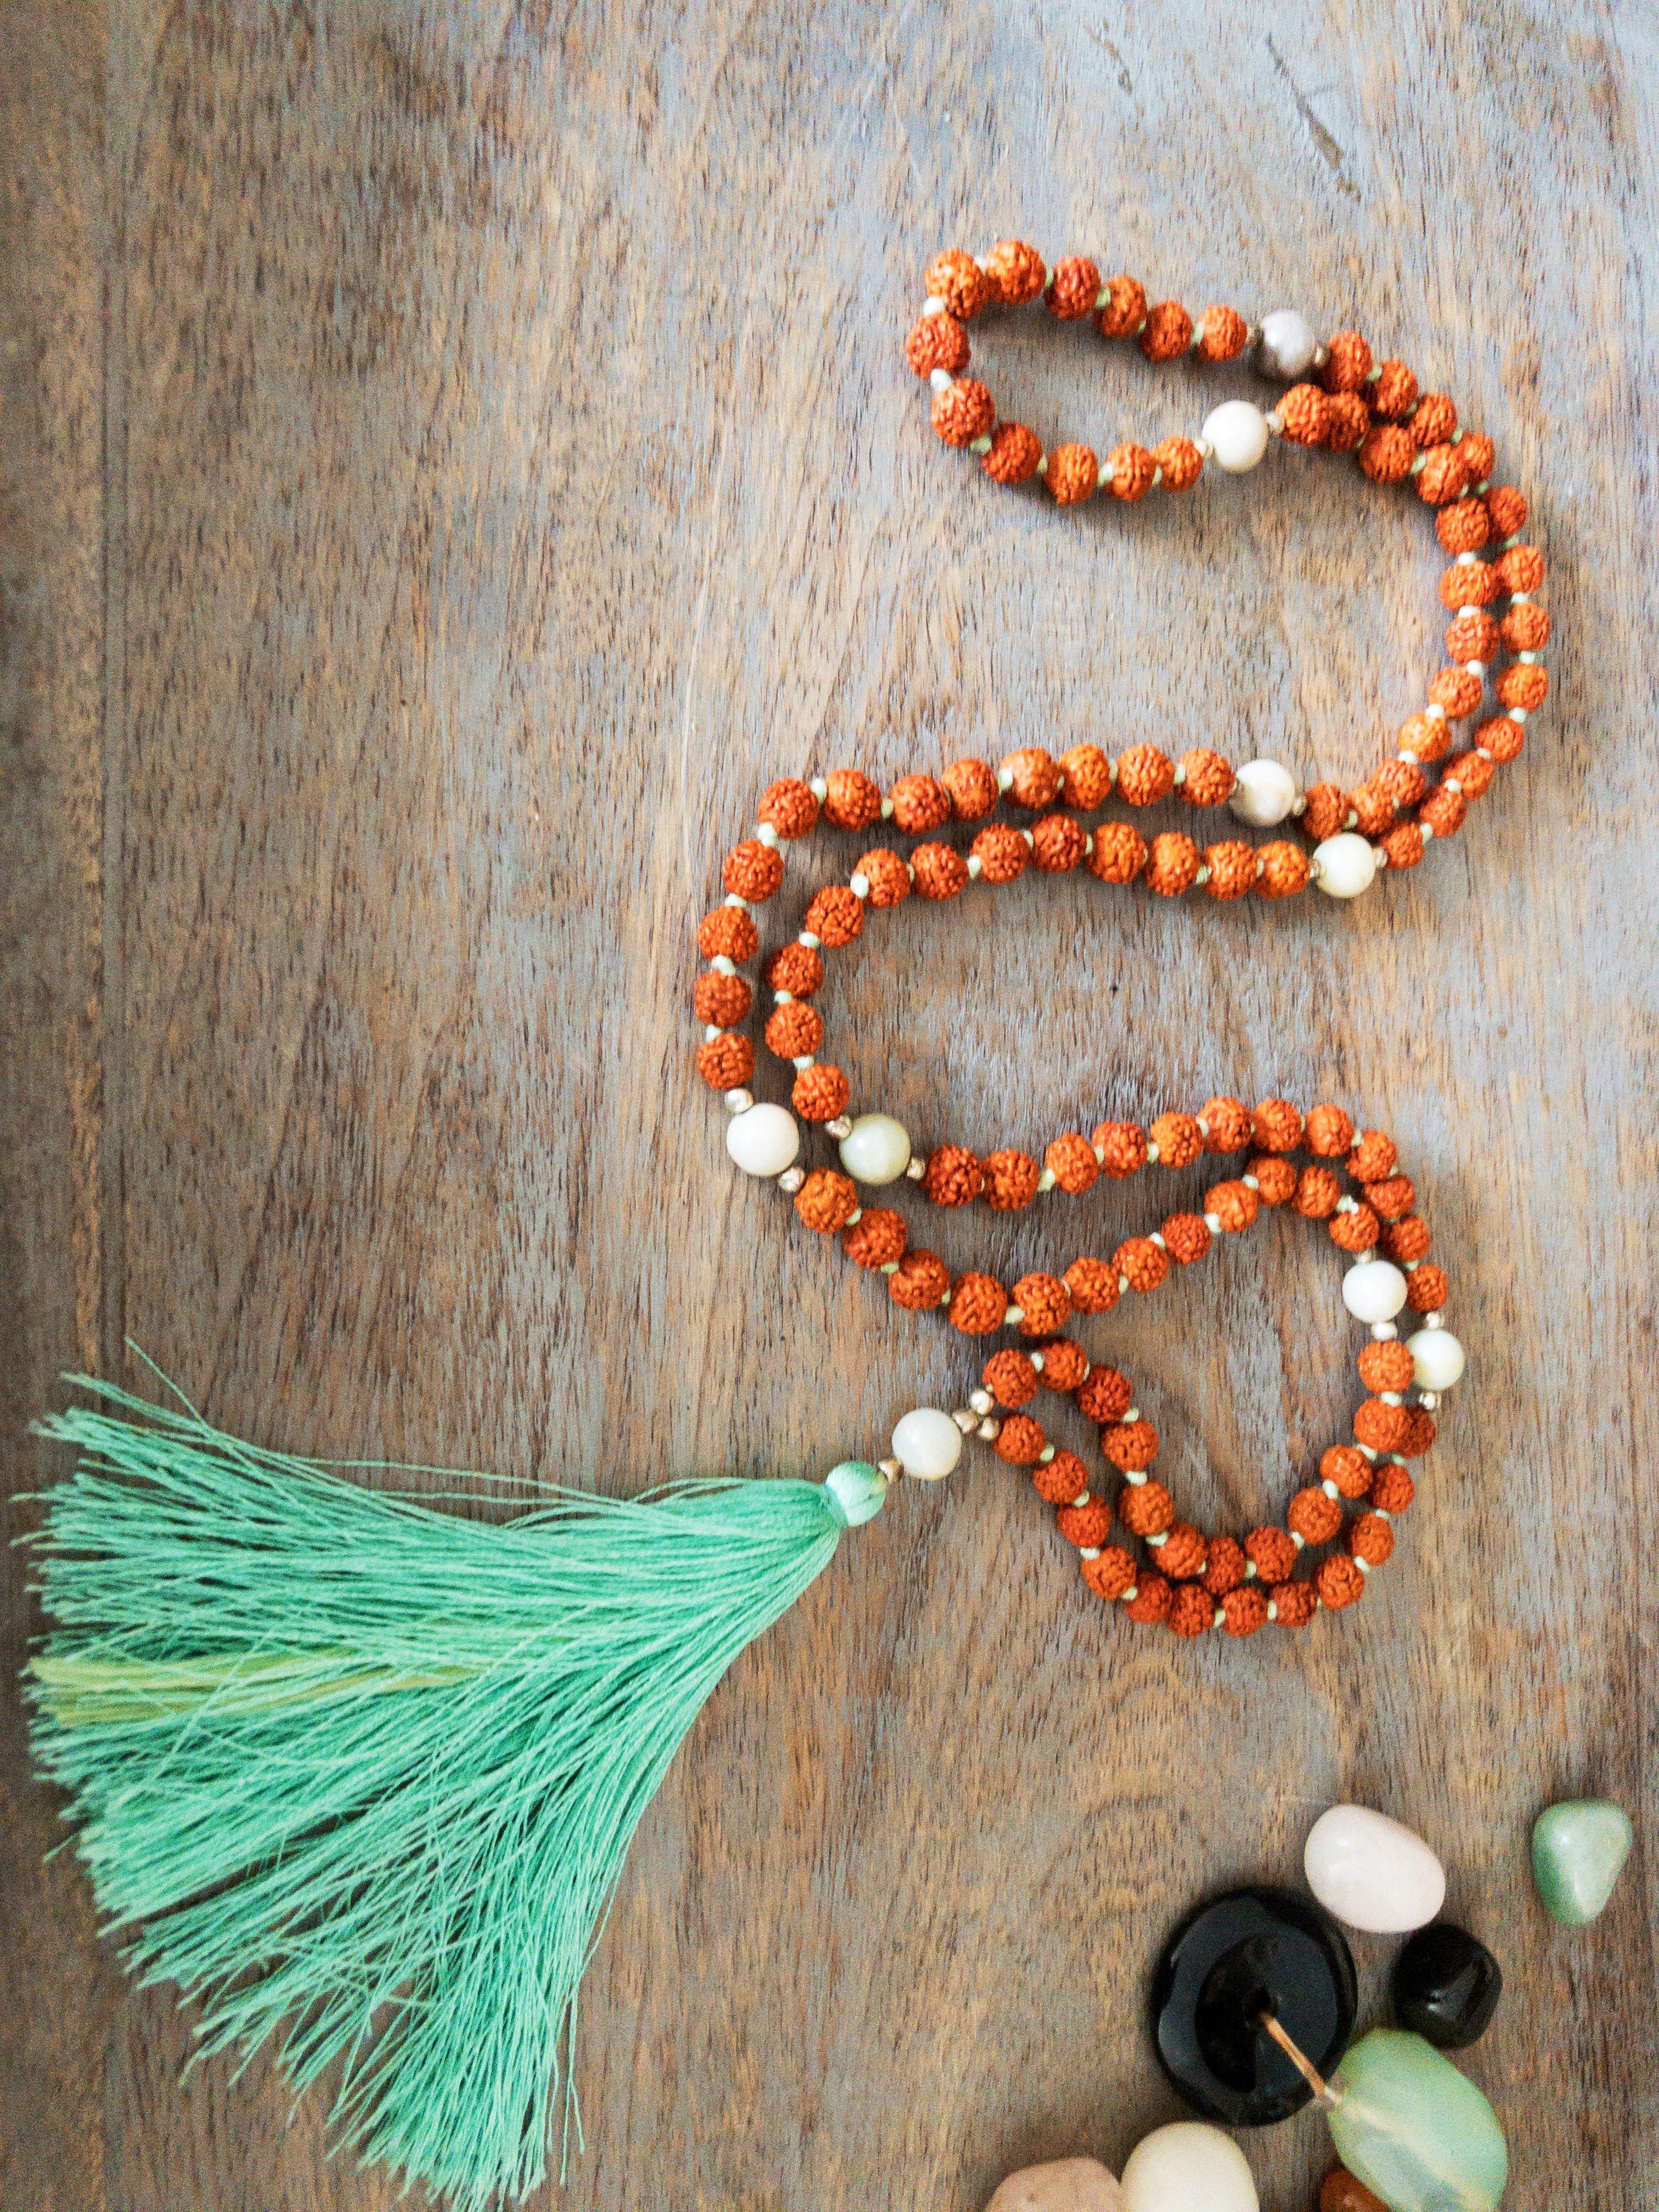 Tassel Necklace japa mala gift yoga mala gift Amazonite mala Rudraksha Mala mala Bead 108 prayer beads gift for yogi